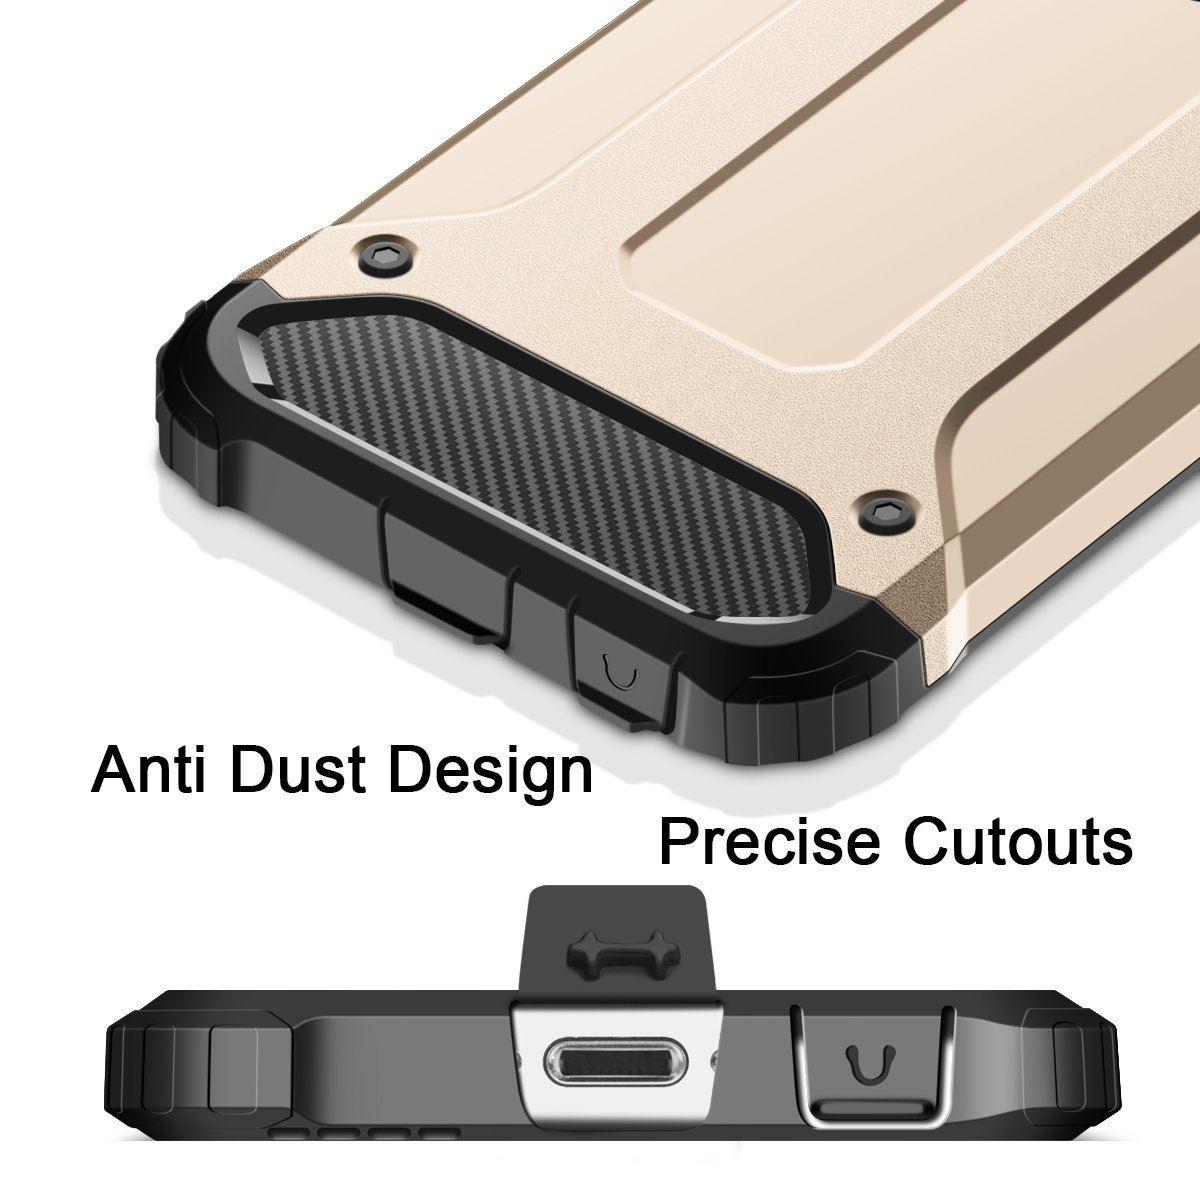 thumbnail 29 - For Apple iPhone 11 Pro Max XR Xs X 8 7 Plus 6 5 Se Case Cover Tough Armor